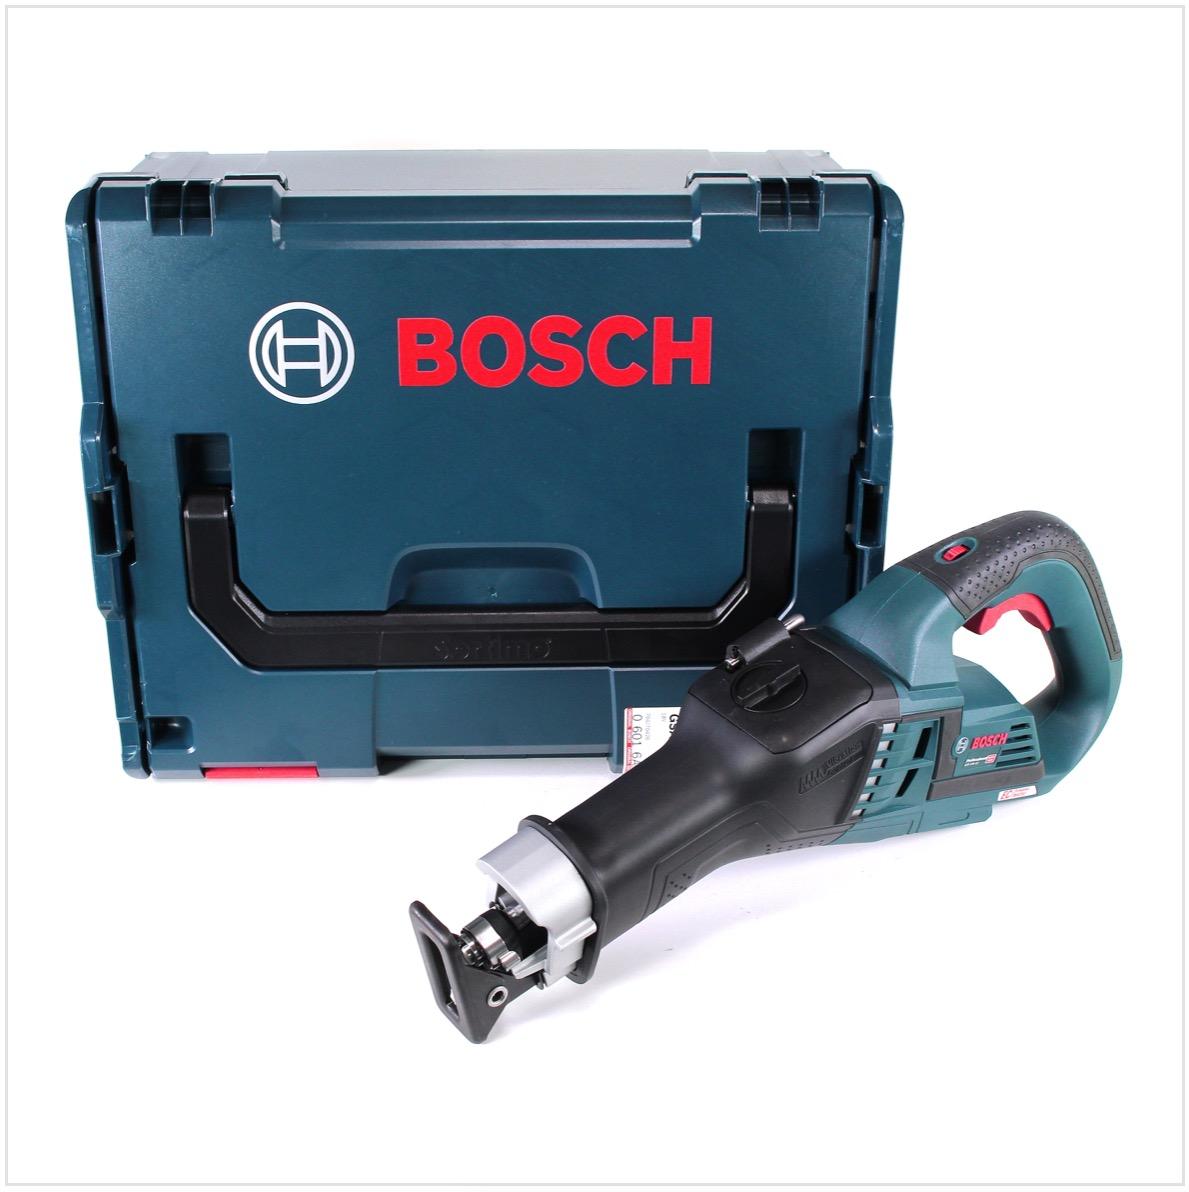 bosch gsa 18v-32 professional akku recipro- / säbelsäge brushless